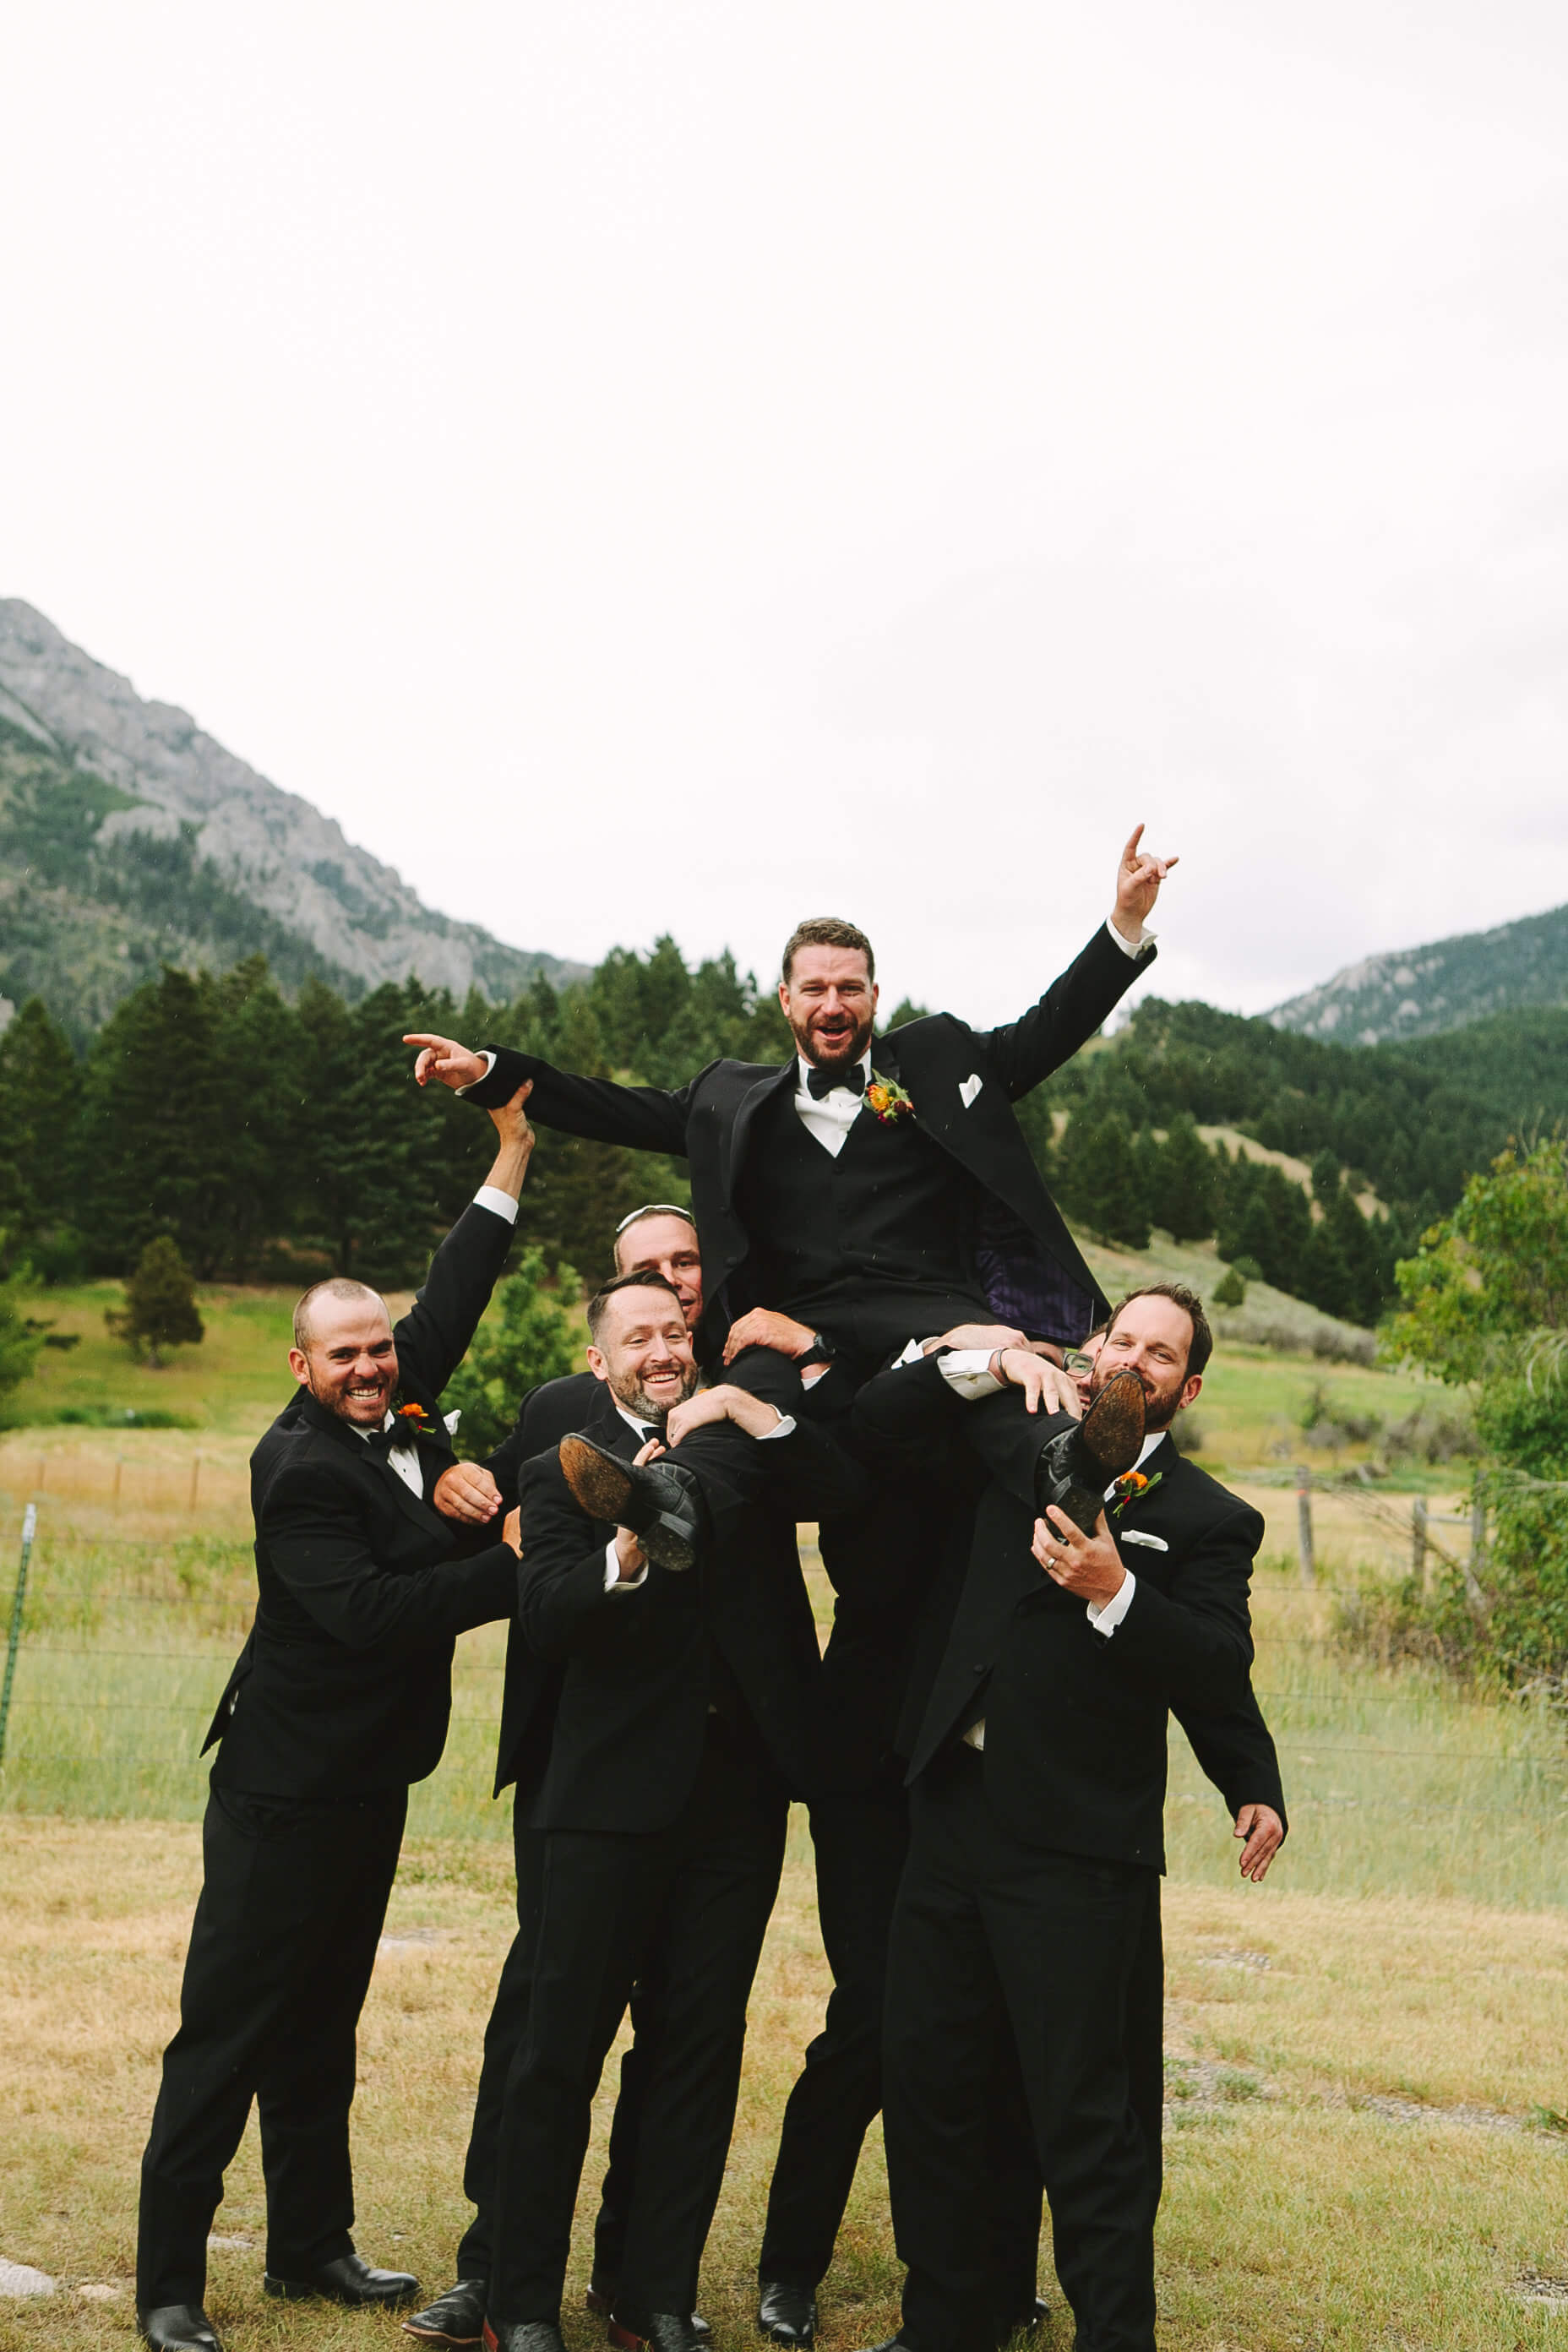 engle-olson-fran-ze-photo-montana-wedding-44.jpg